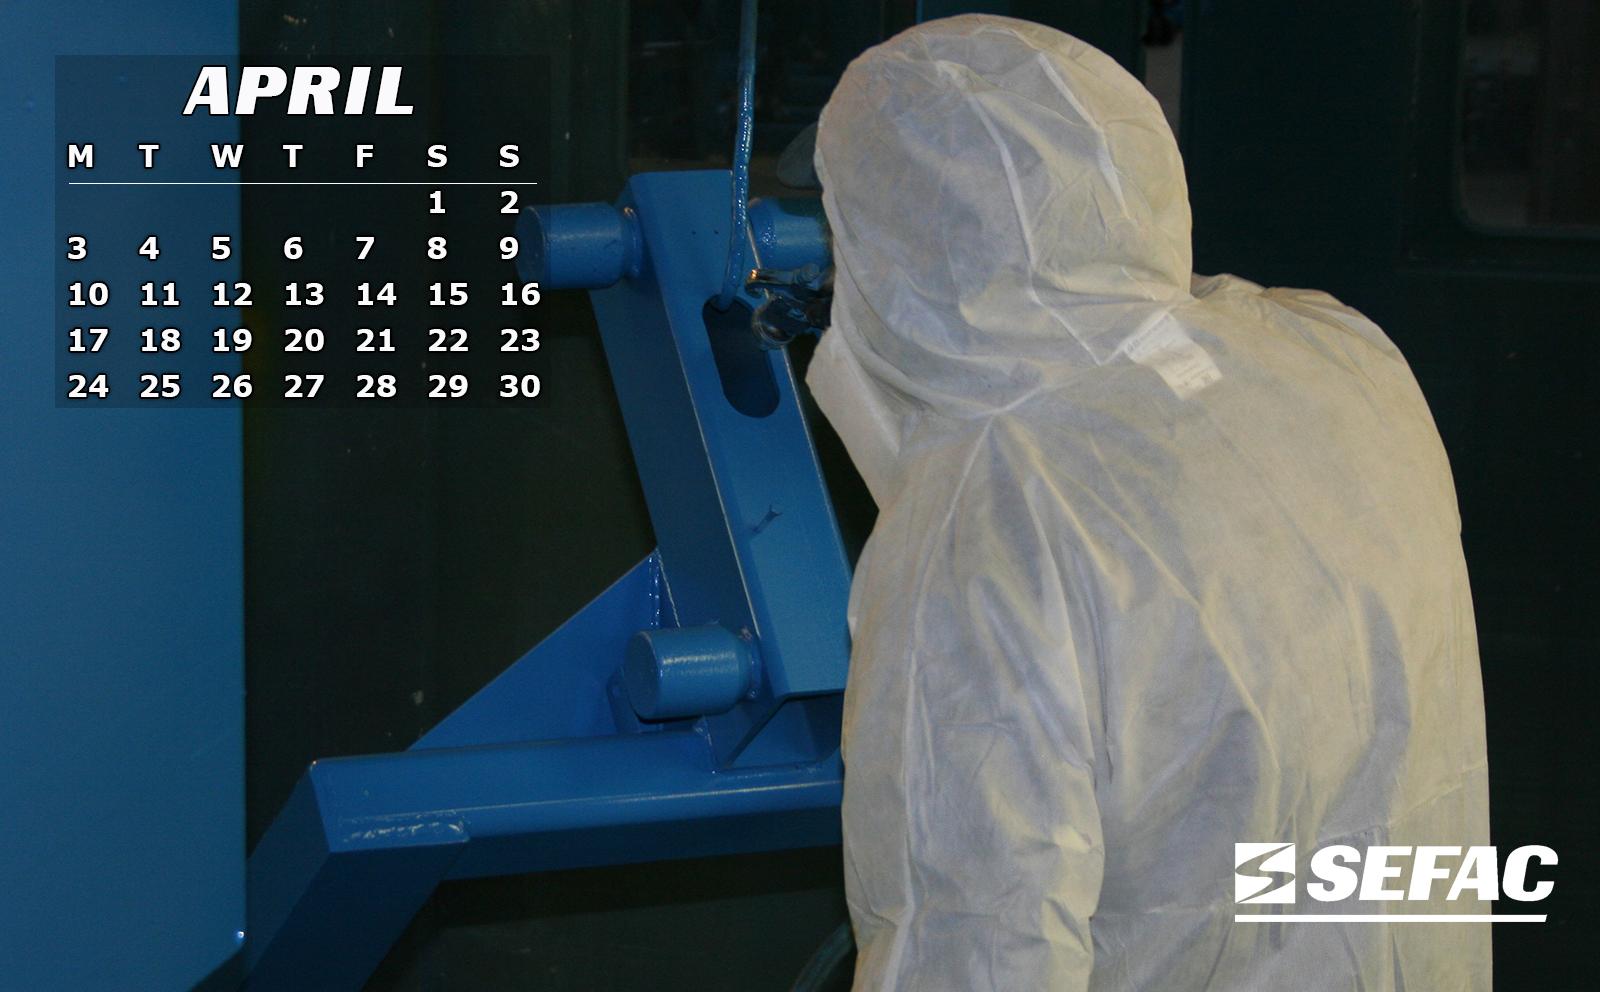 2017-04-Wallpaper-En-Manufacturer